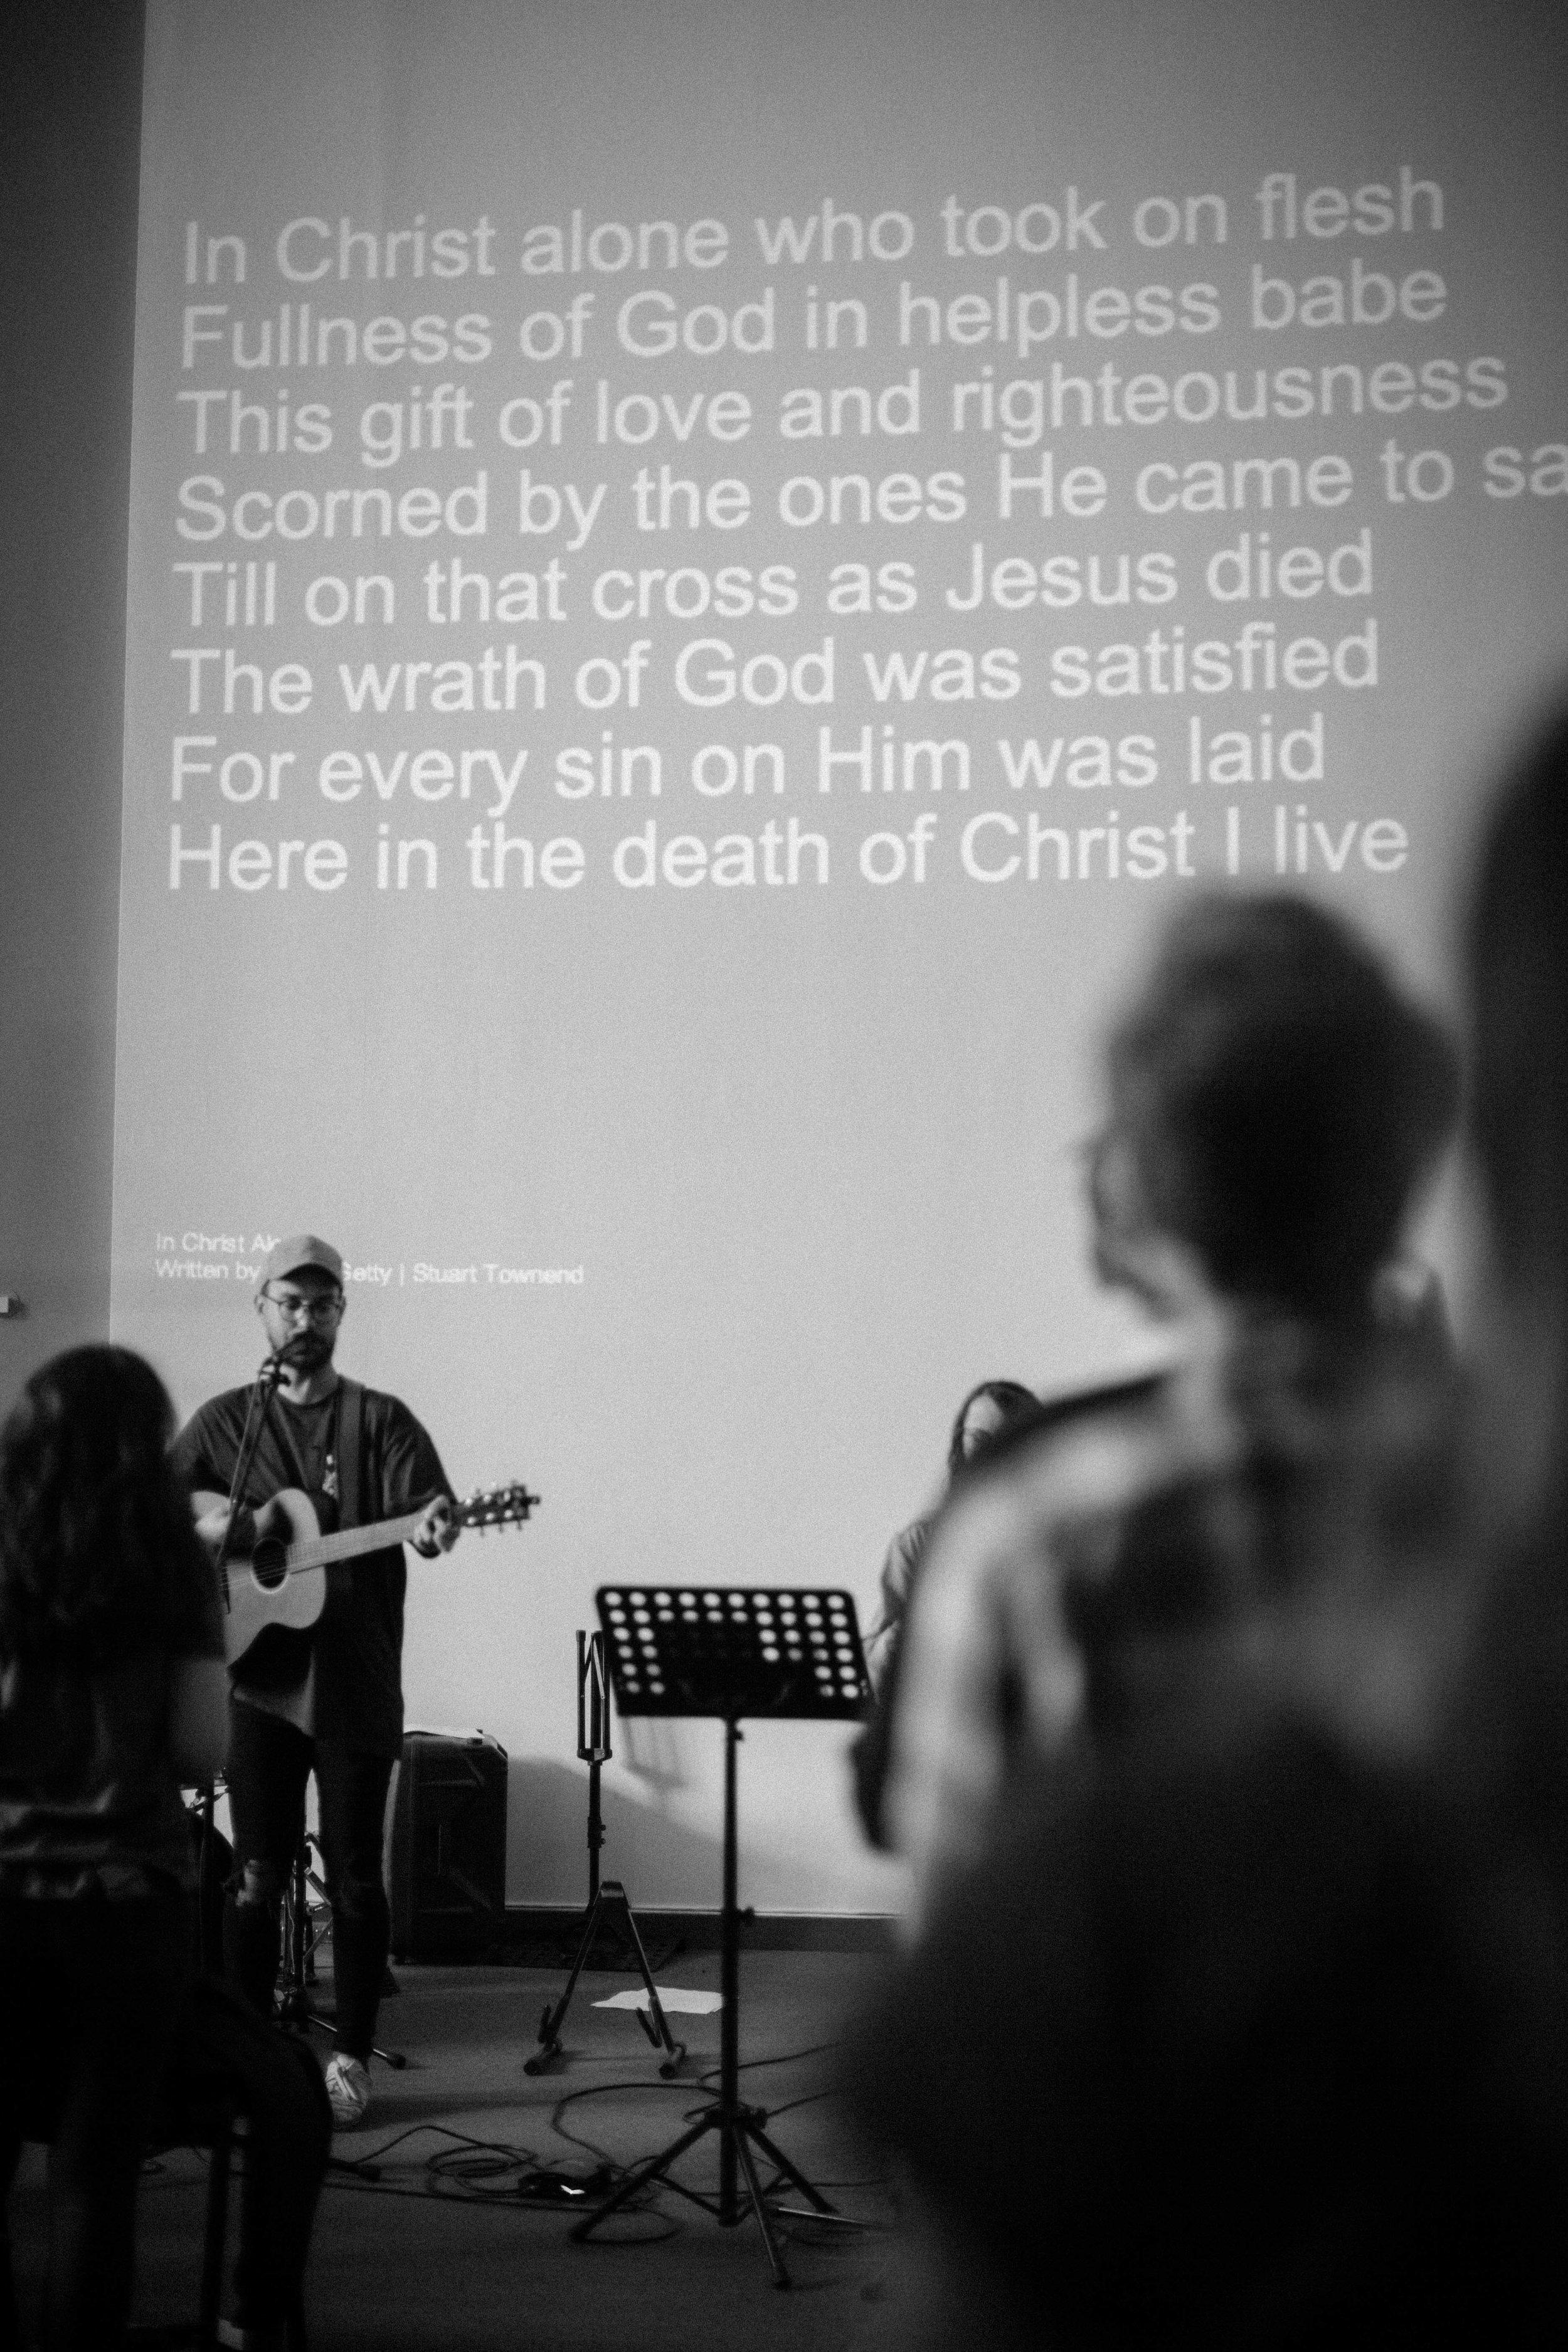 worship_0315.jpg